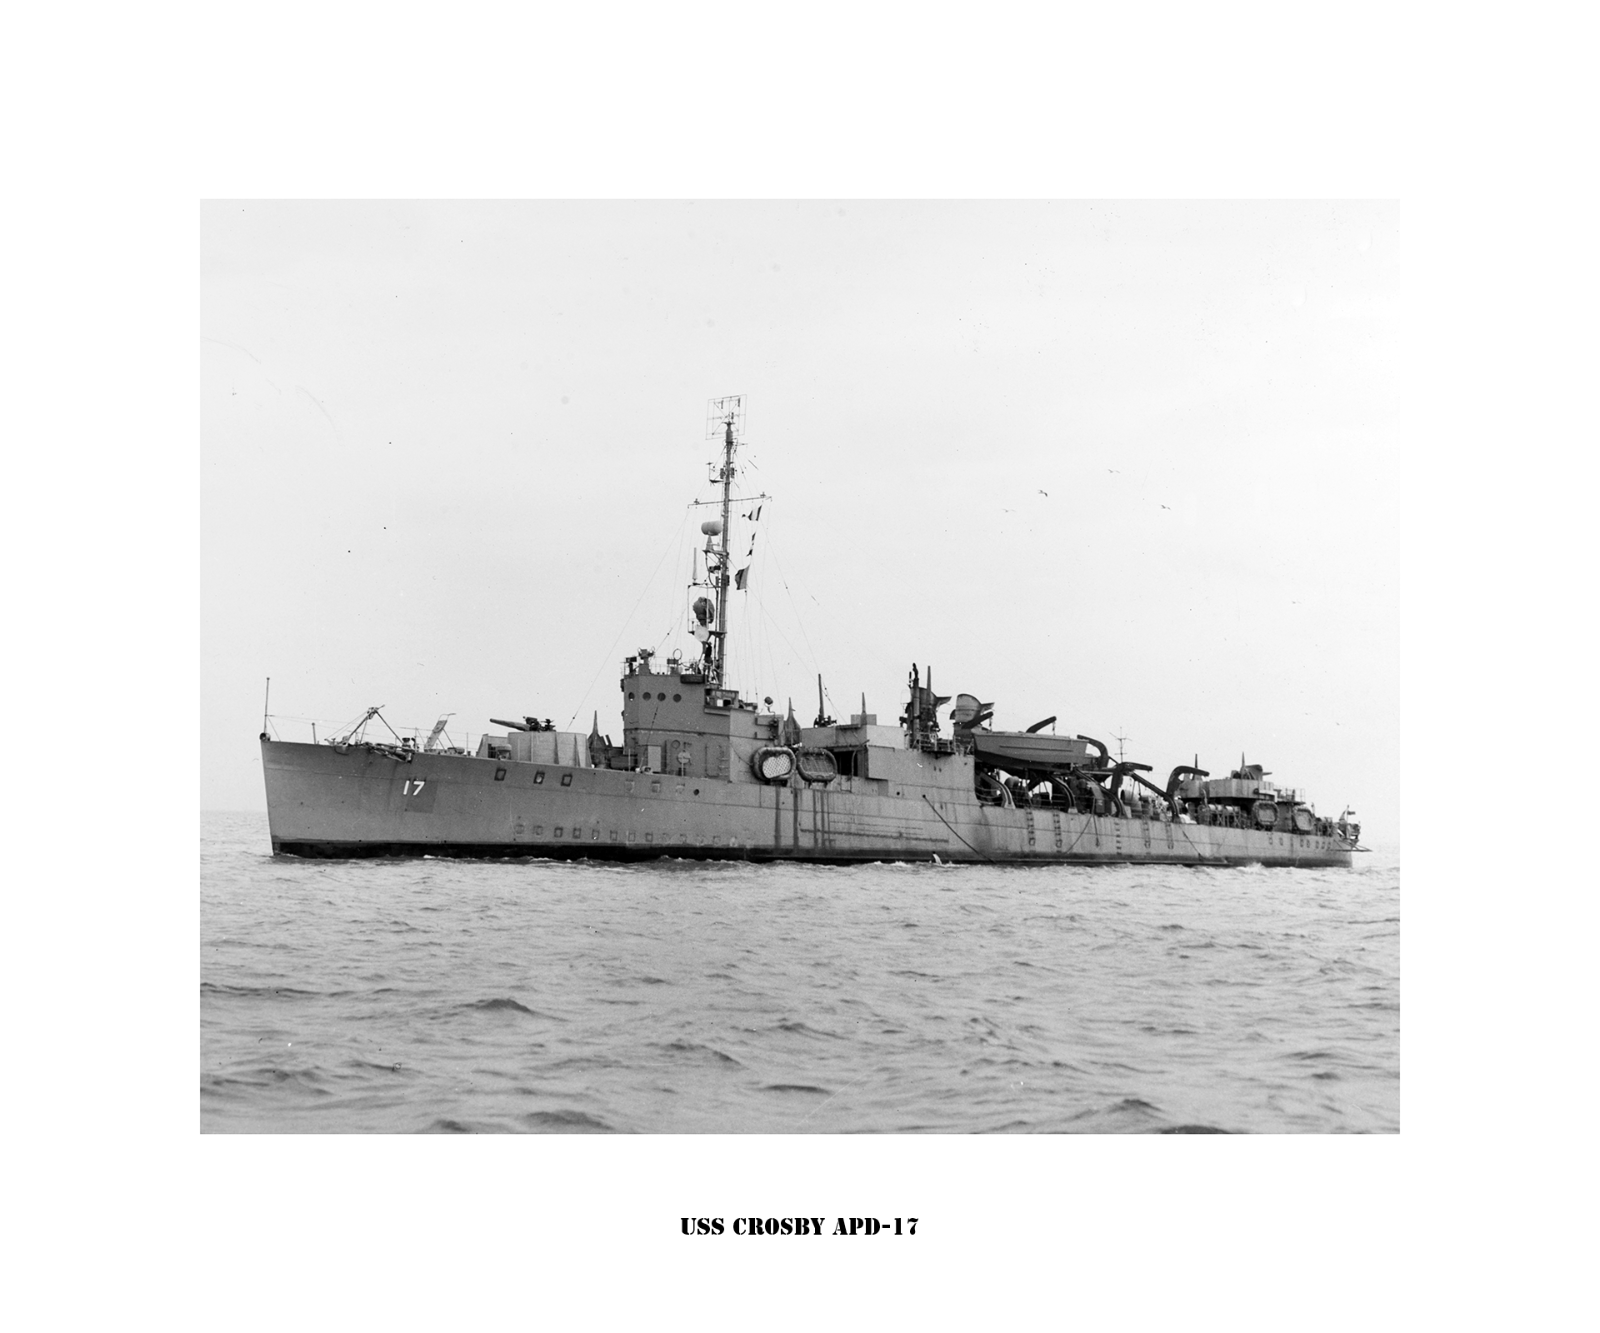 USS Crosby (APD-17) -- Naval Ship Photo Drucken, USN Navy